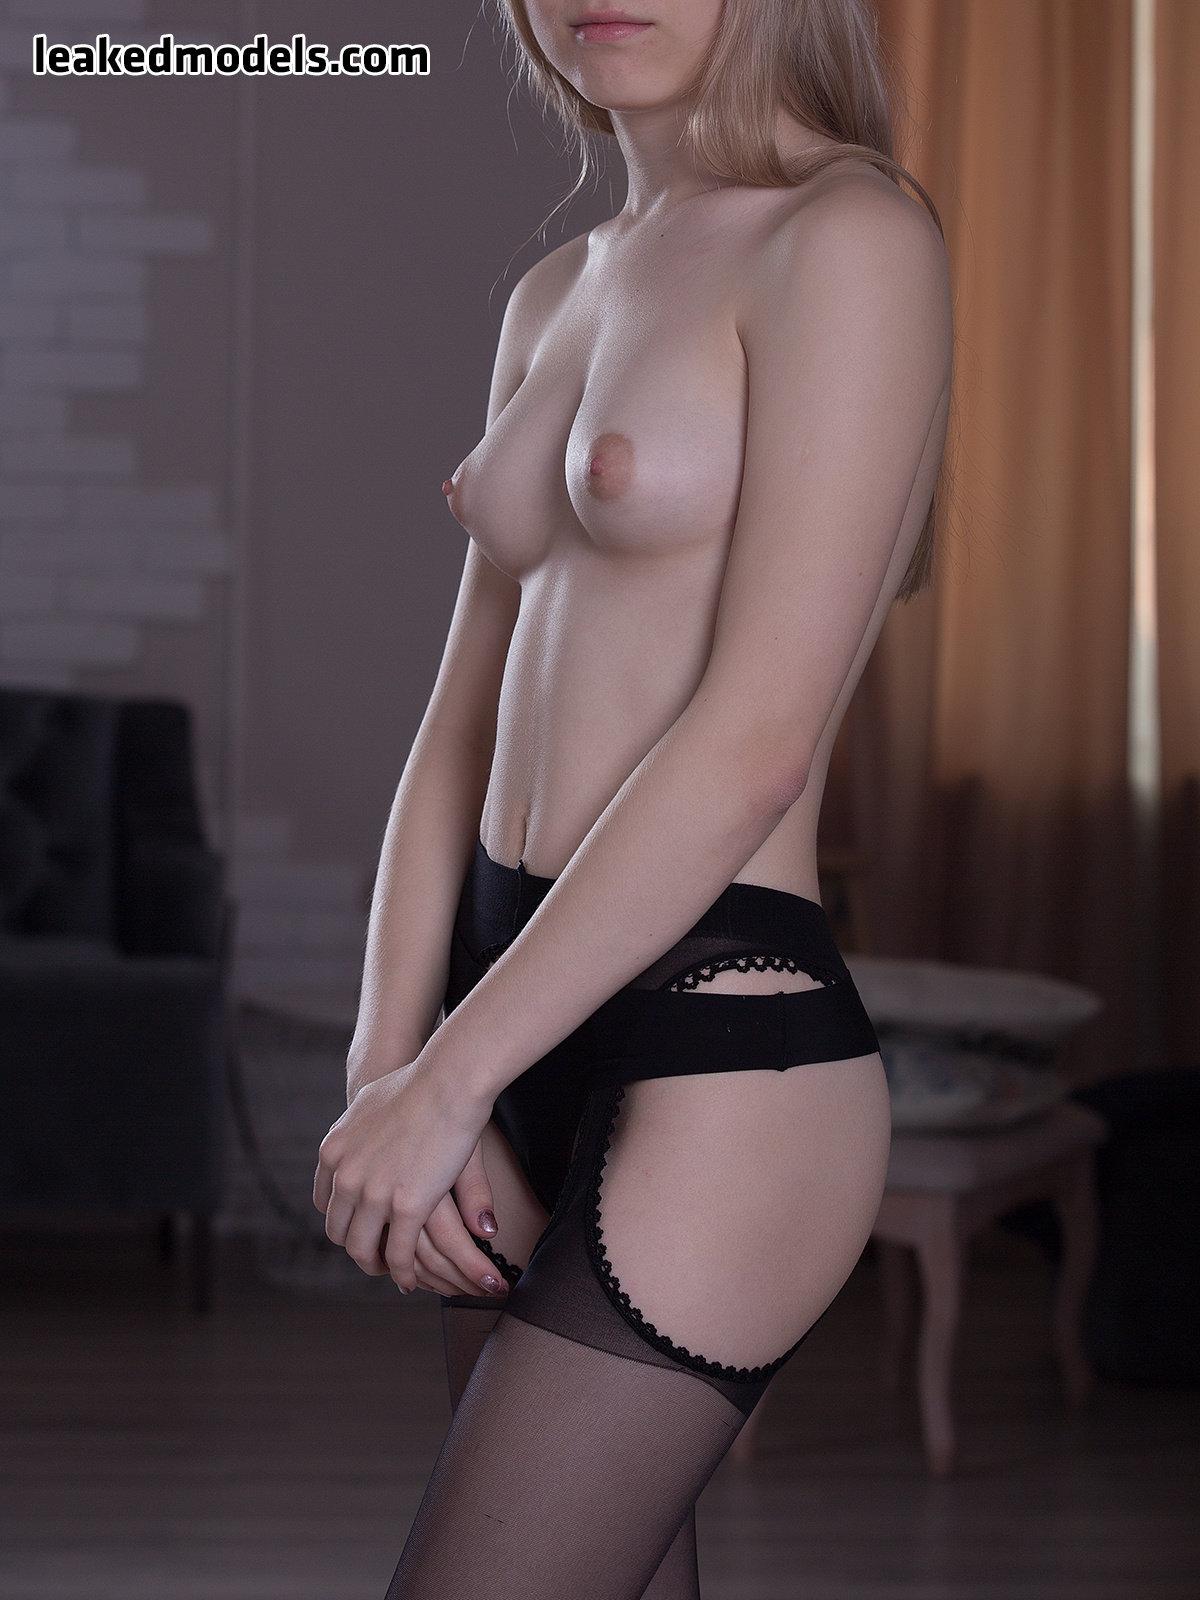 RareViktoriya – redr Patreon Nude Leaks (27 Photos)